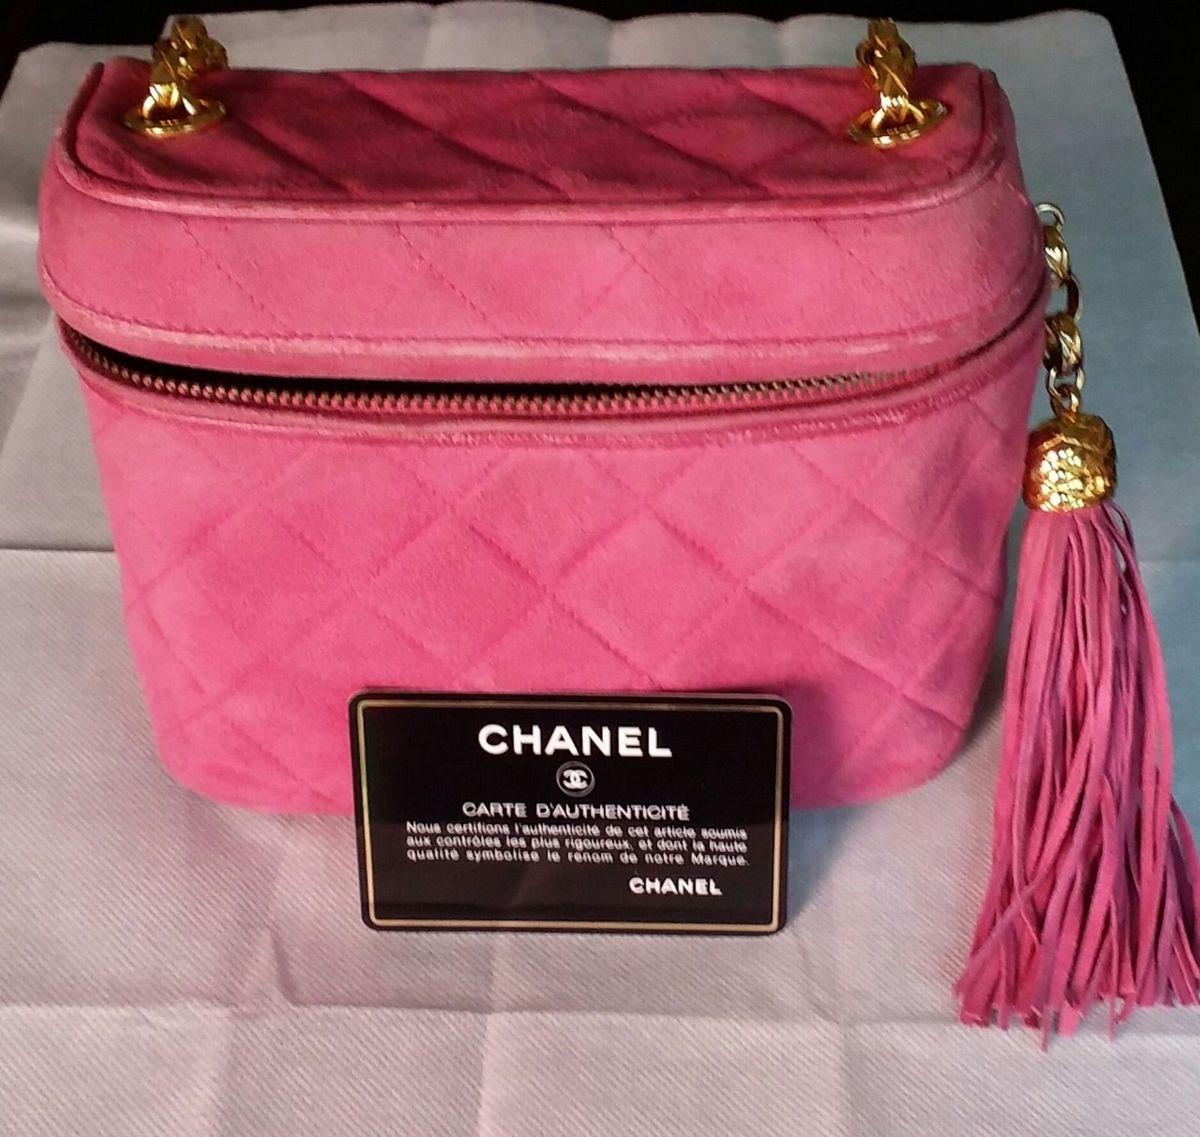 635255b7b bolsa chanel vintage rosa - bolsas chanel.  Czm6ly9wag90b3muzw5qb2vplmnvbs5ici9wcm9kdwn0cy83mdm4mdq0lzvkndg4otg3mmq1ntewymjimme1mjrlntlhyjy2zmrjlmpwzw